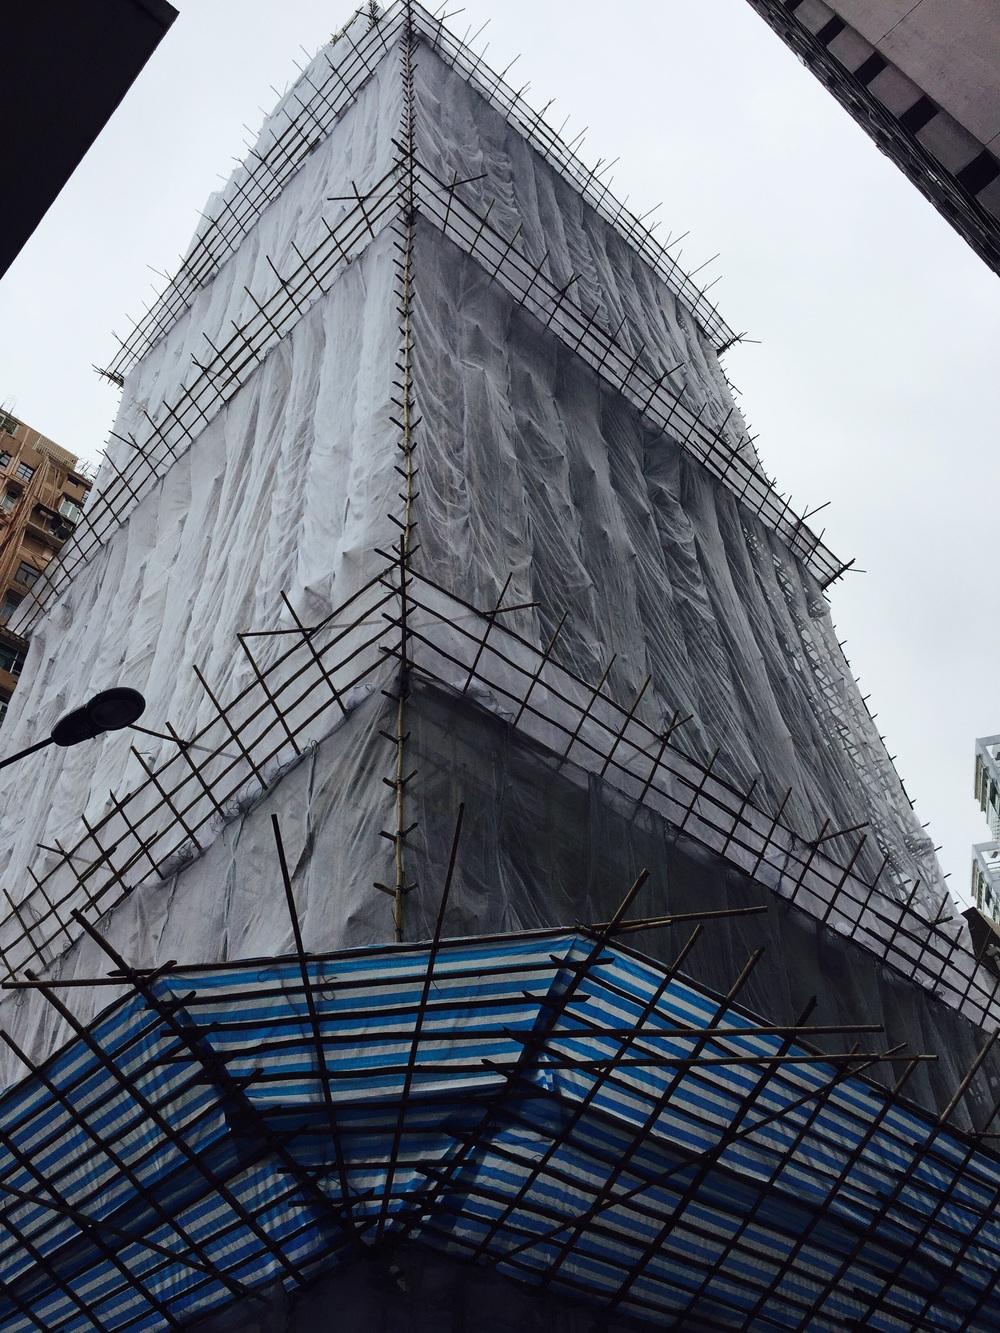 Bamboo scaffolding!